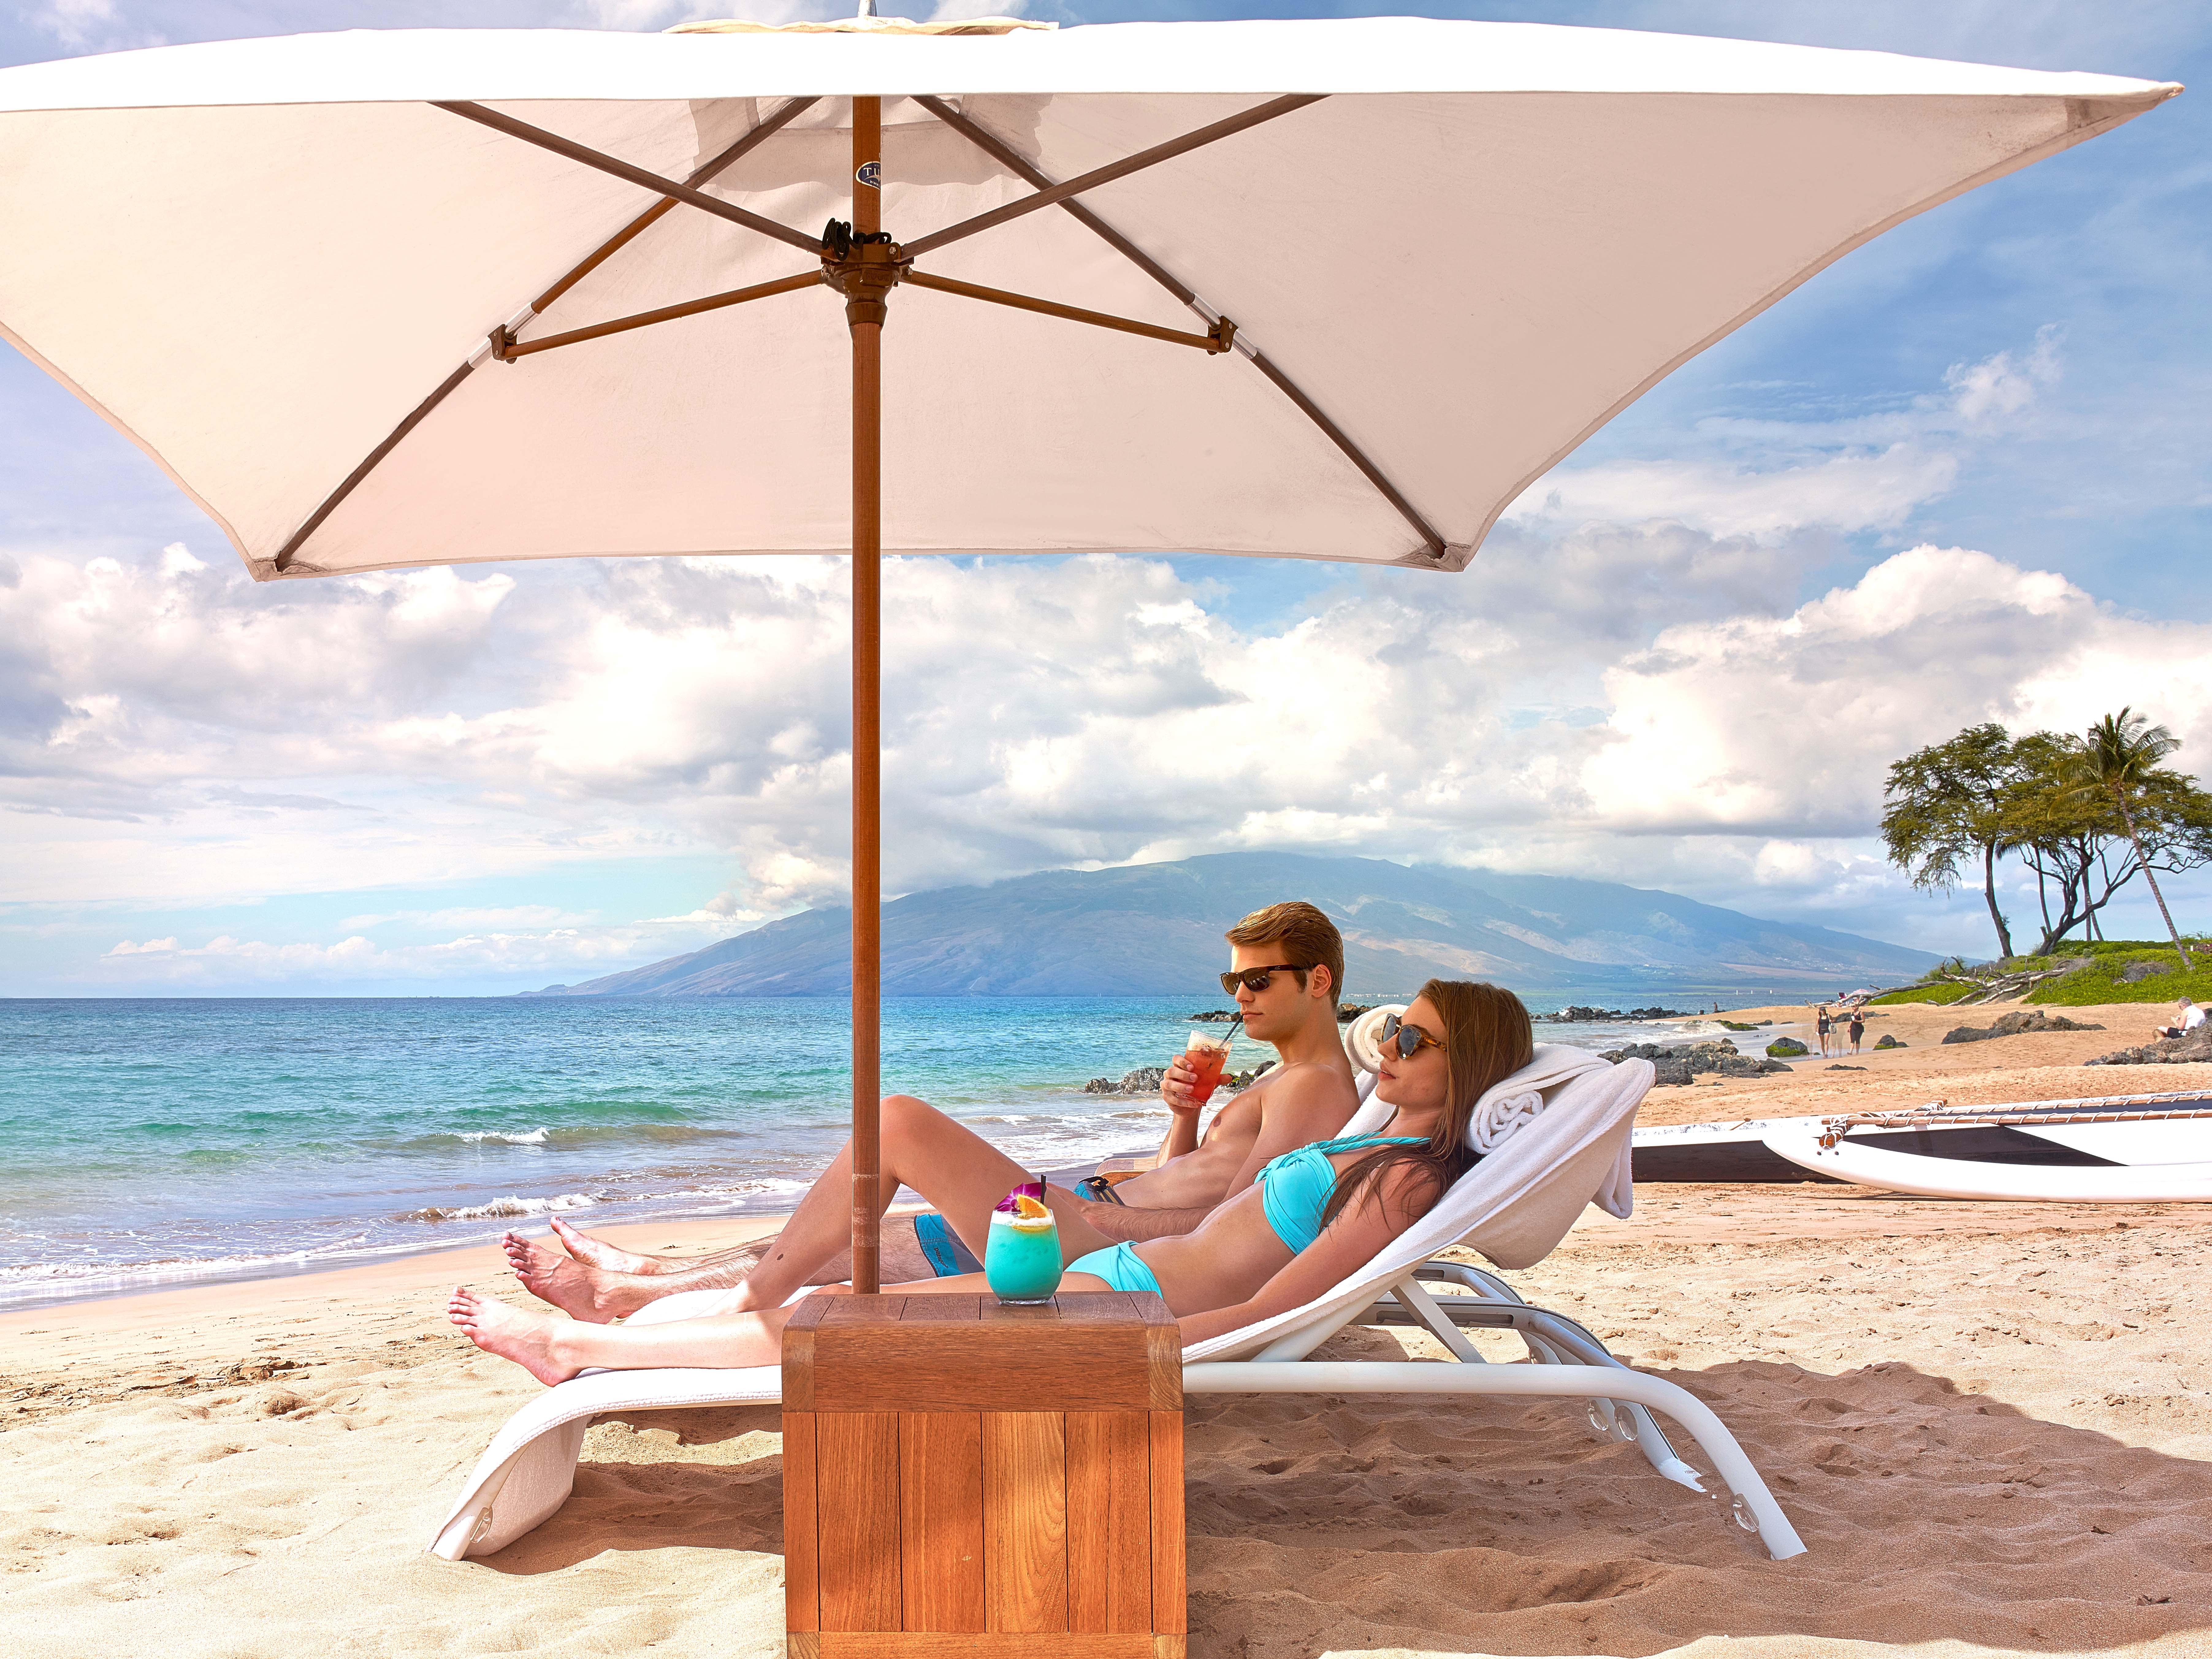 Andaz Maui Beach